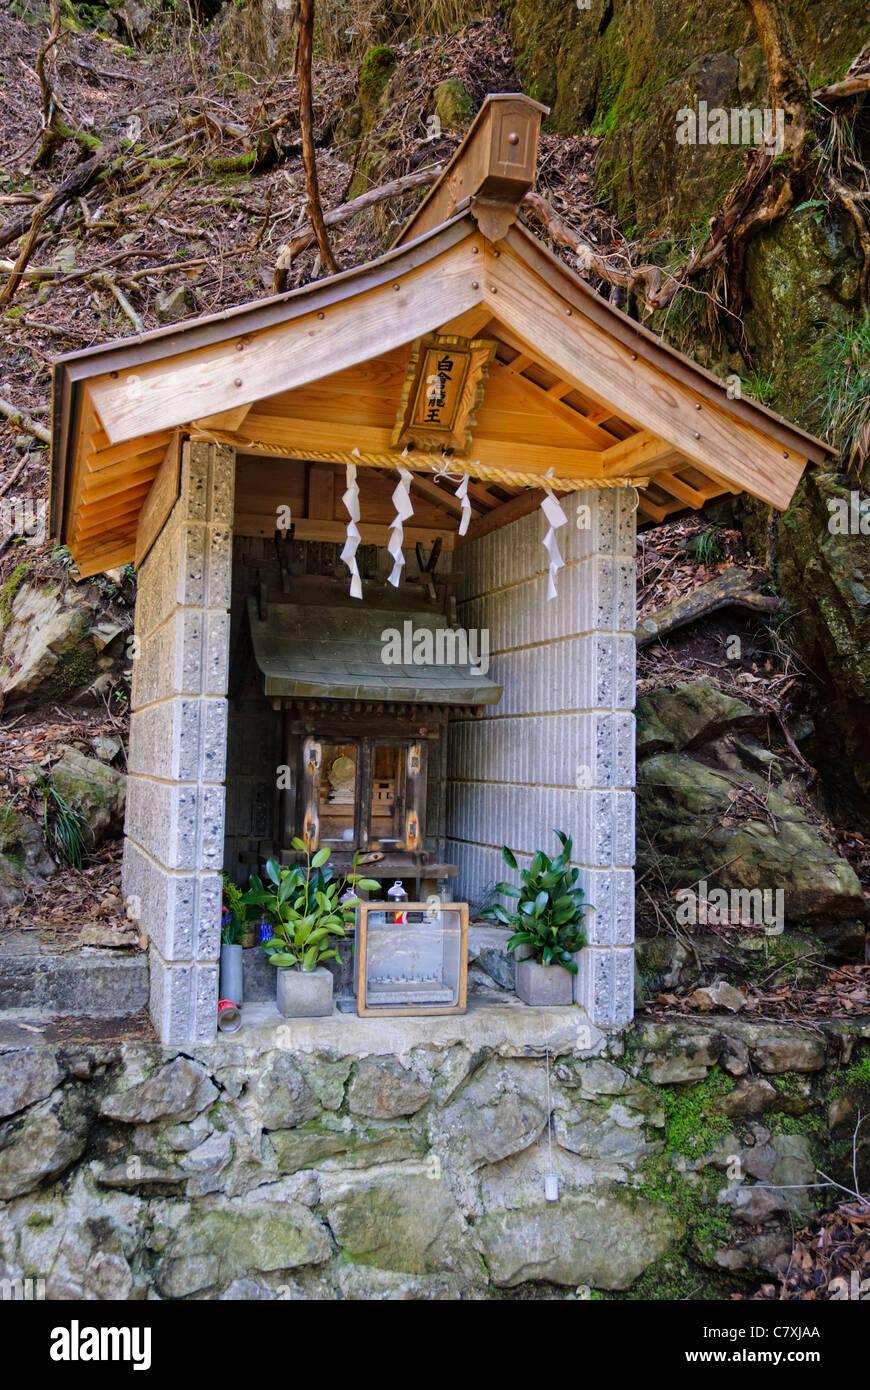 Hokora Or Small Wayside Japanese Shinto Shrine In The